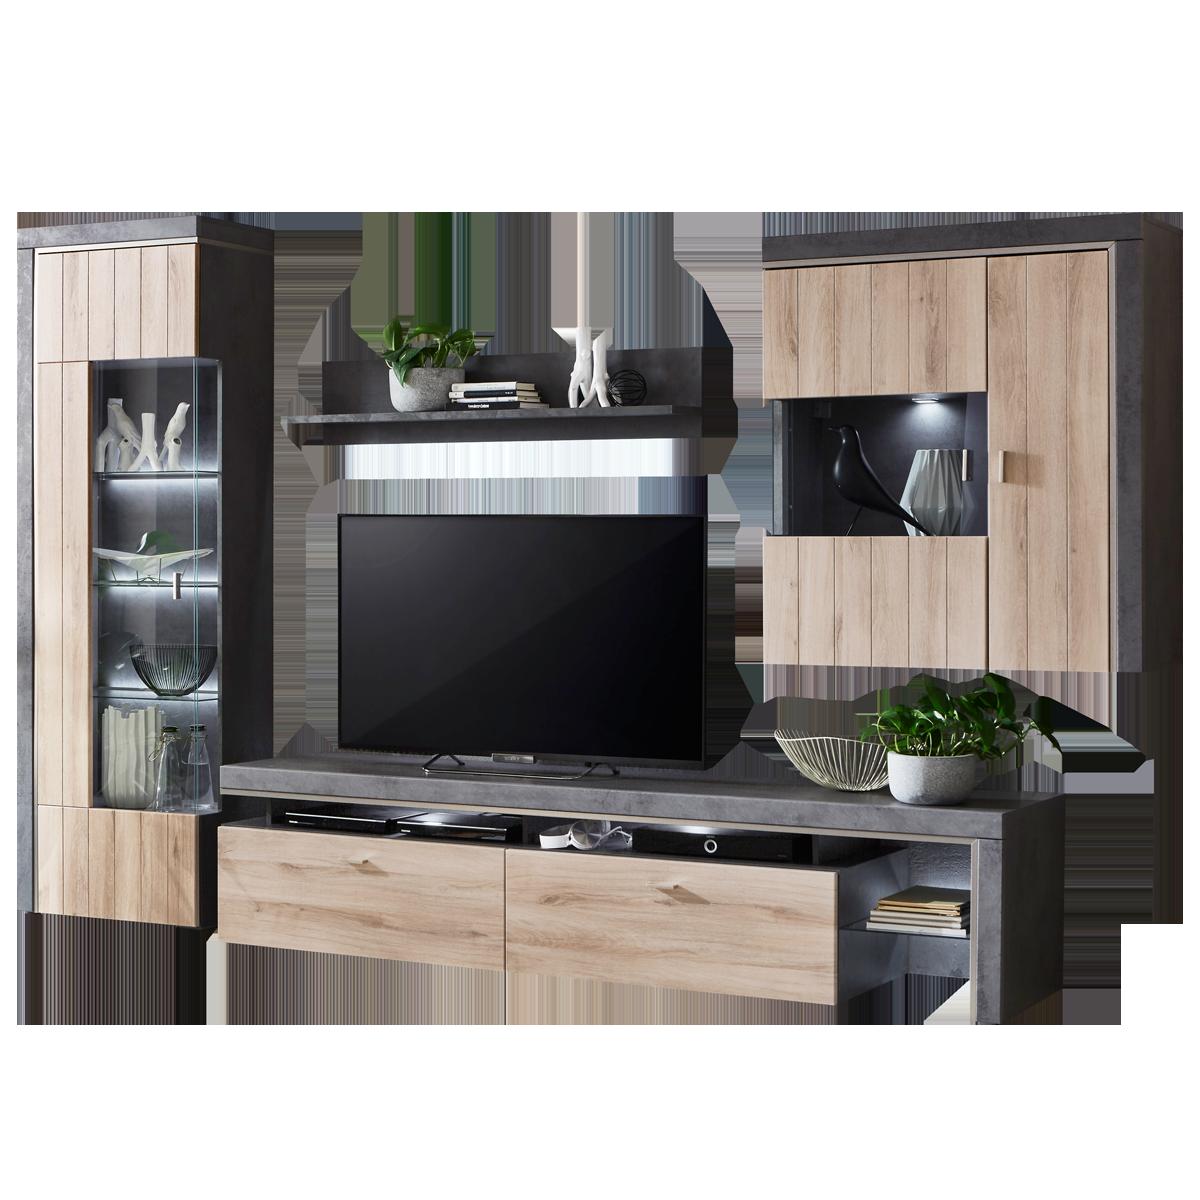 Häufig Ideal-Möbel Ribeira Wohnkombination 04 moderne 4-teilige Wohnwand FE29